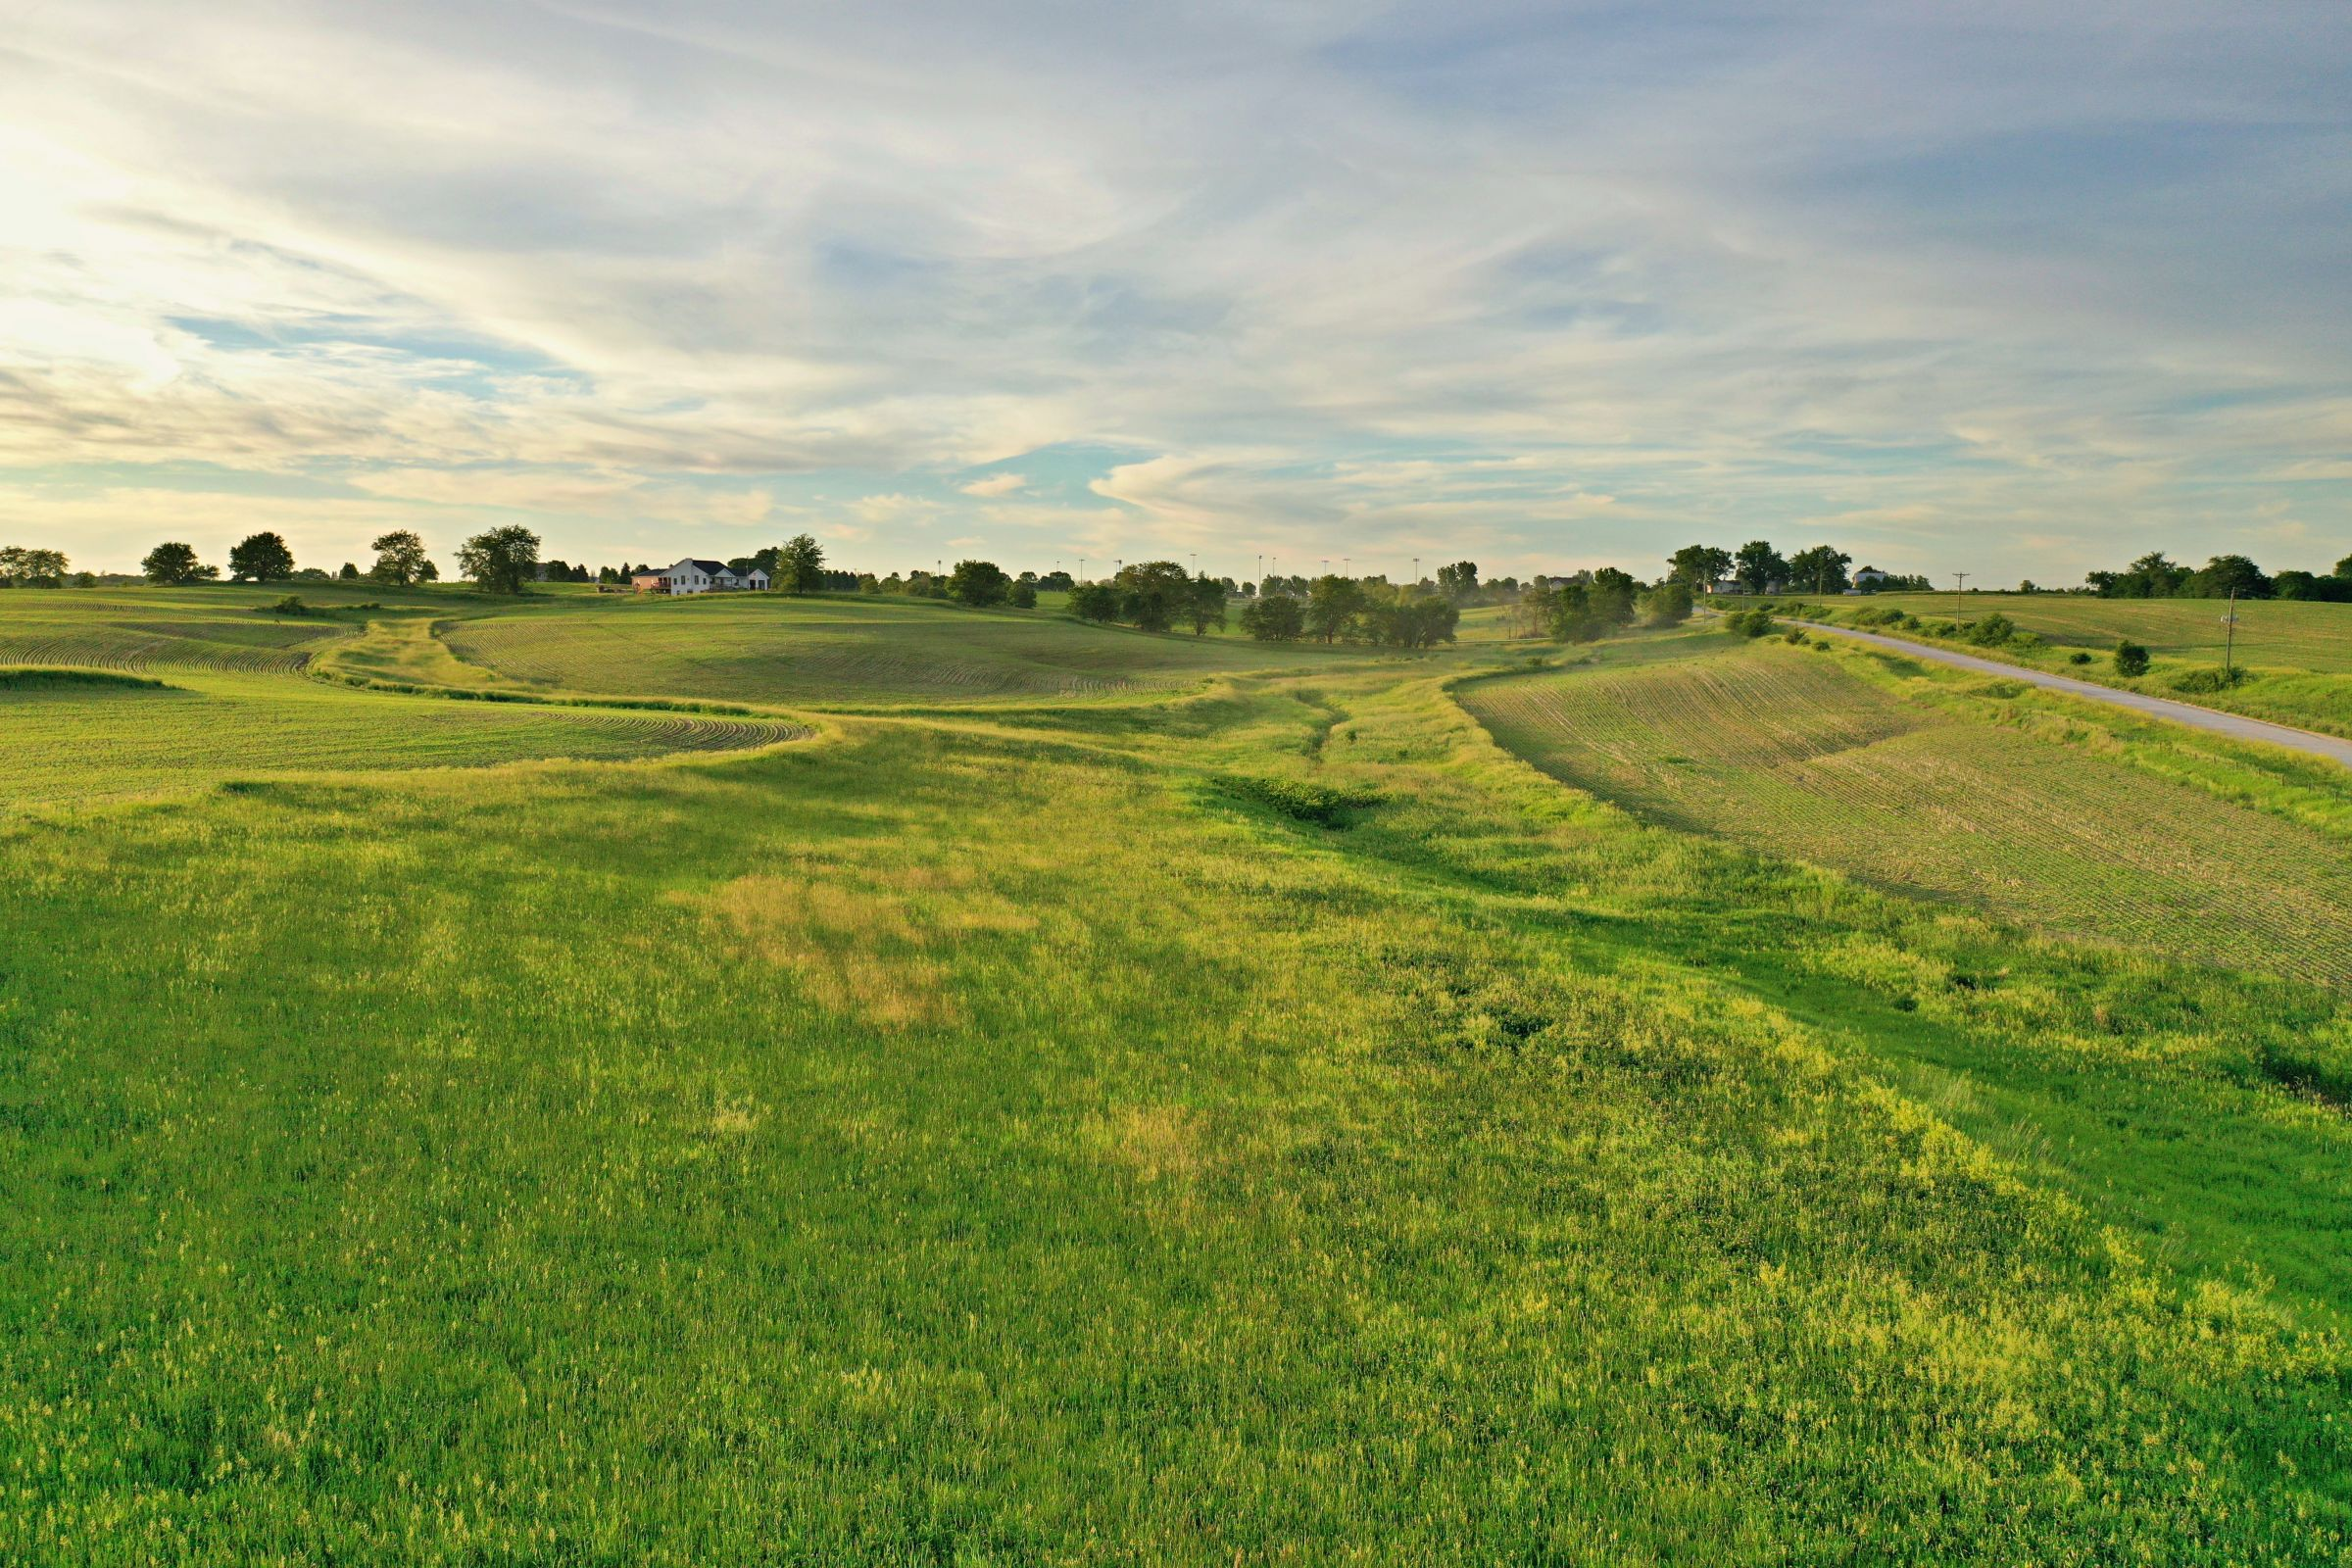 land-warren-county-iowa-20-acres-listing-number-15426-1-2021-03-24-185841.JPG